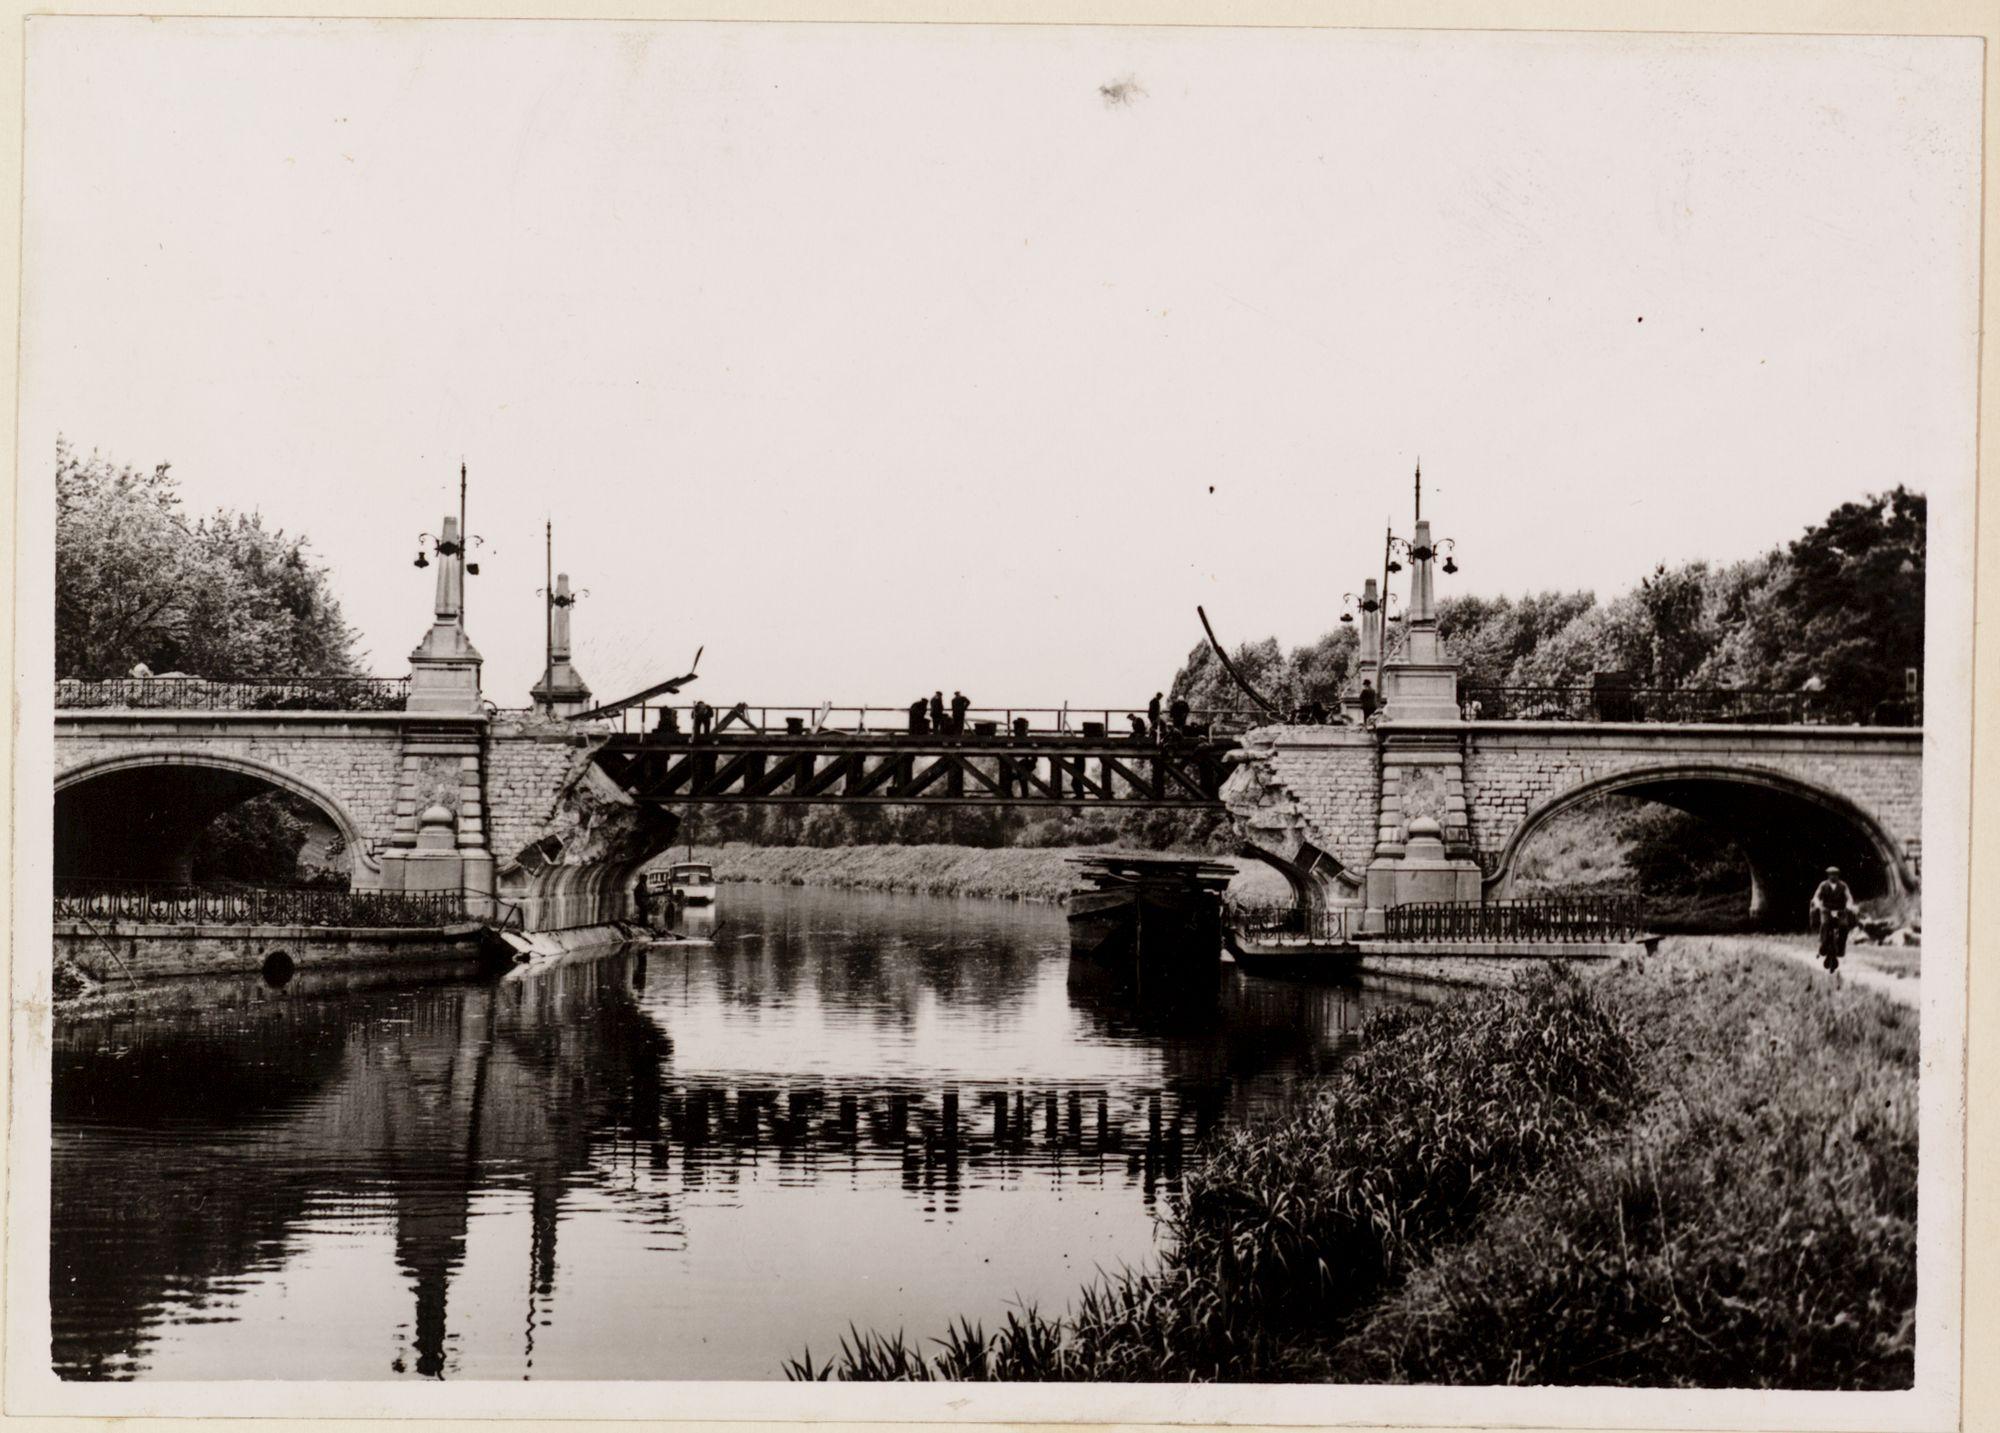 Gent: Koning Albertbrug